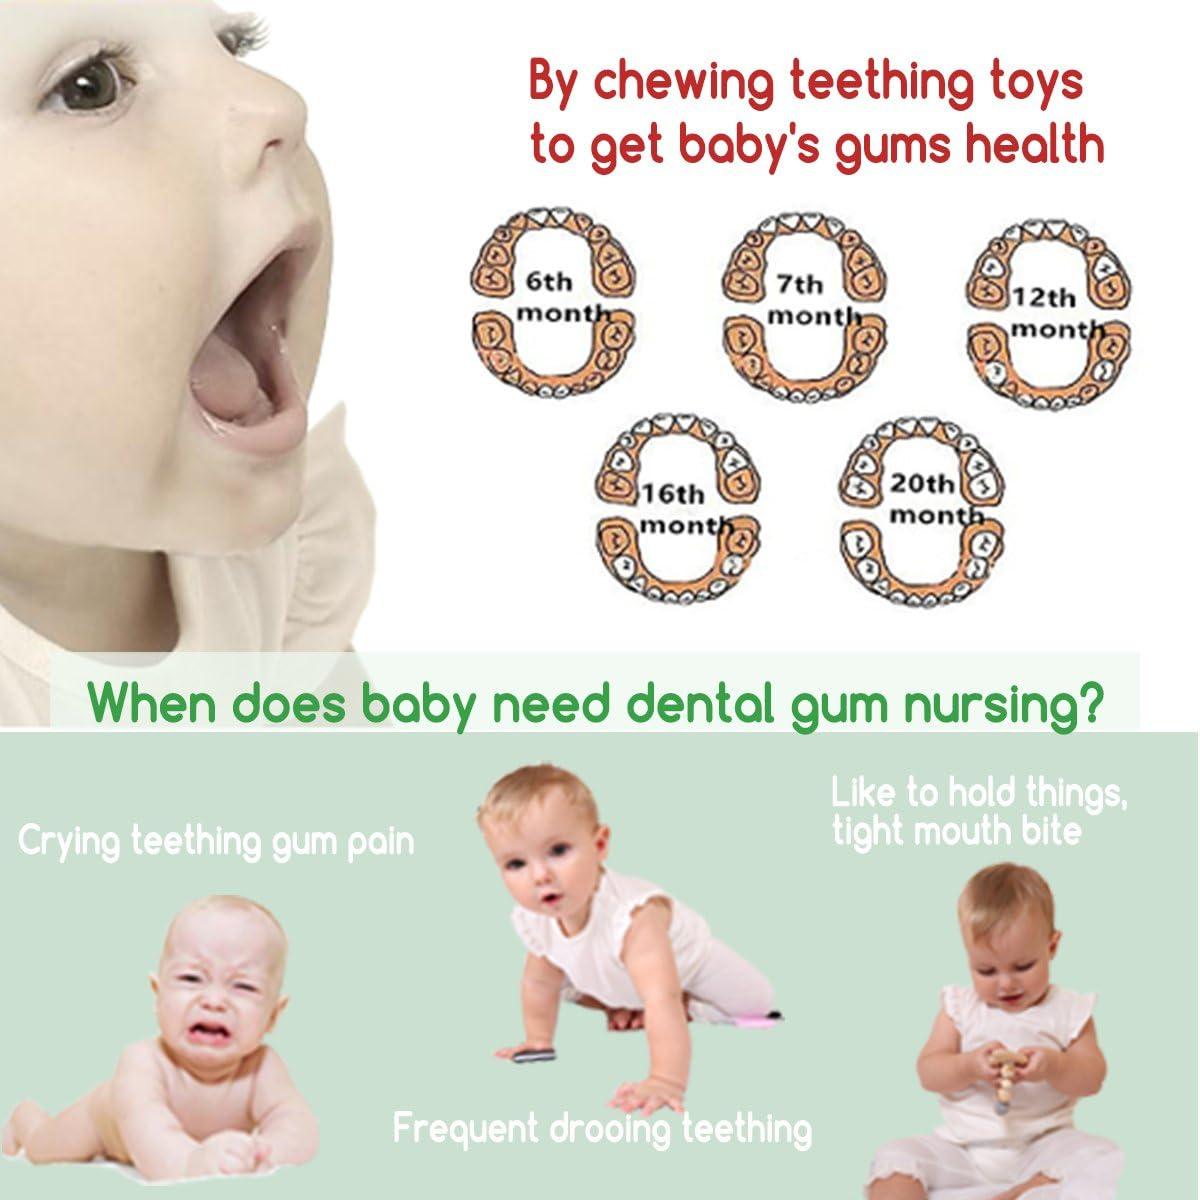 Best for baby Anillo de madera Cuentas de Ganchillo Collar de lactancia Juguete de dentici/ón para beb/és Juguete Montessori